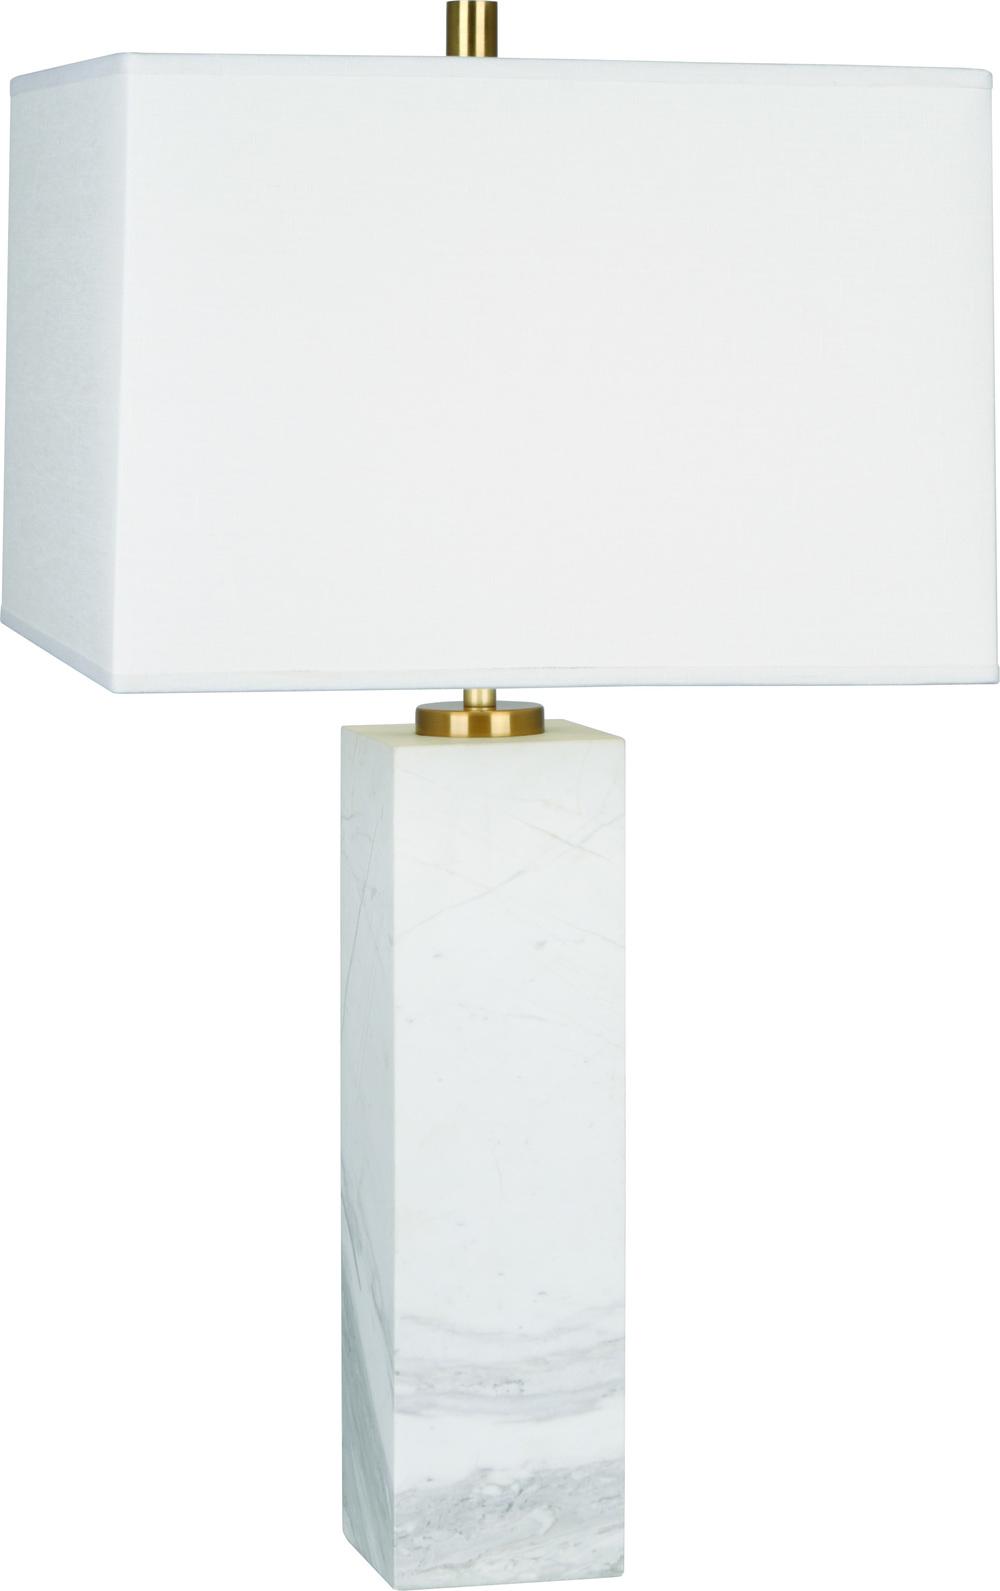 Robert Abbey - Jonathan Adler Canaan Table Lamp